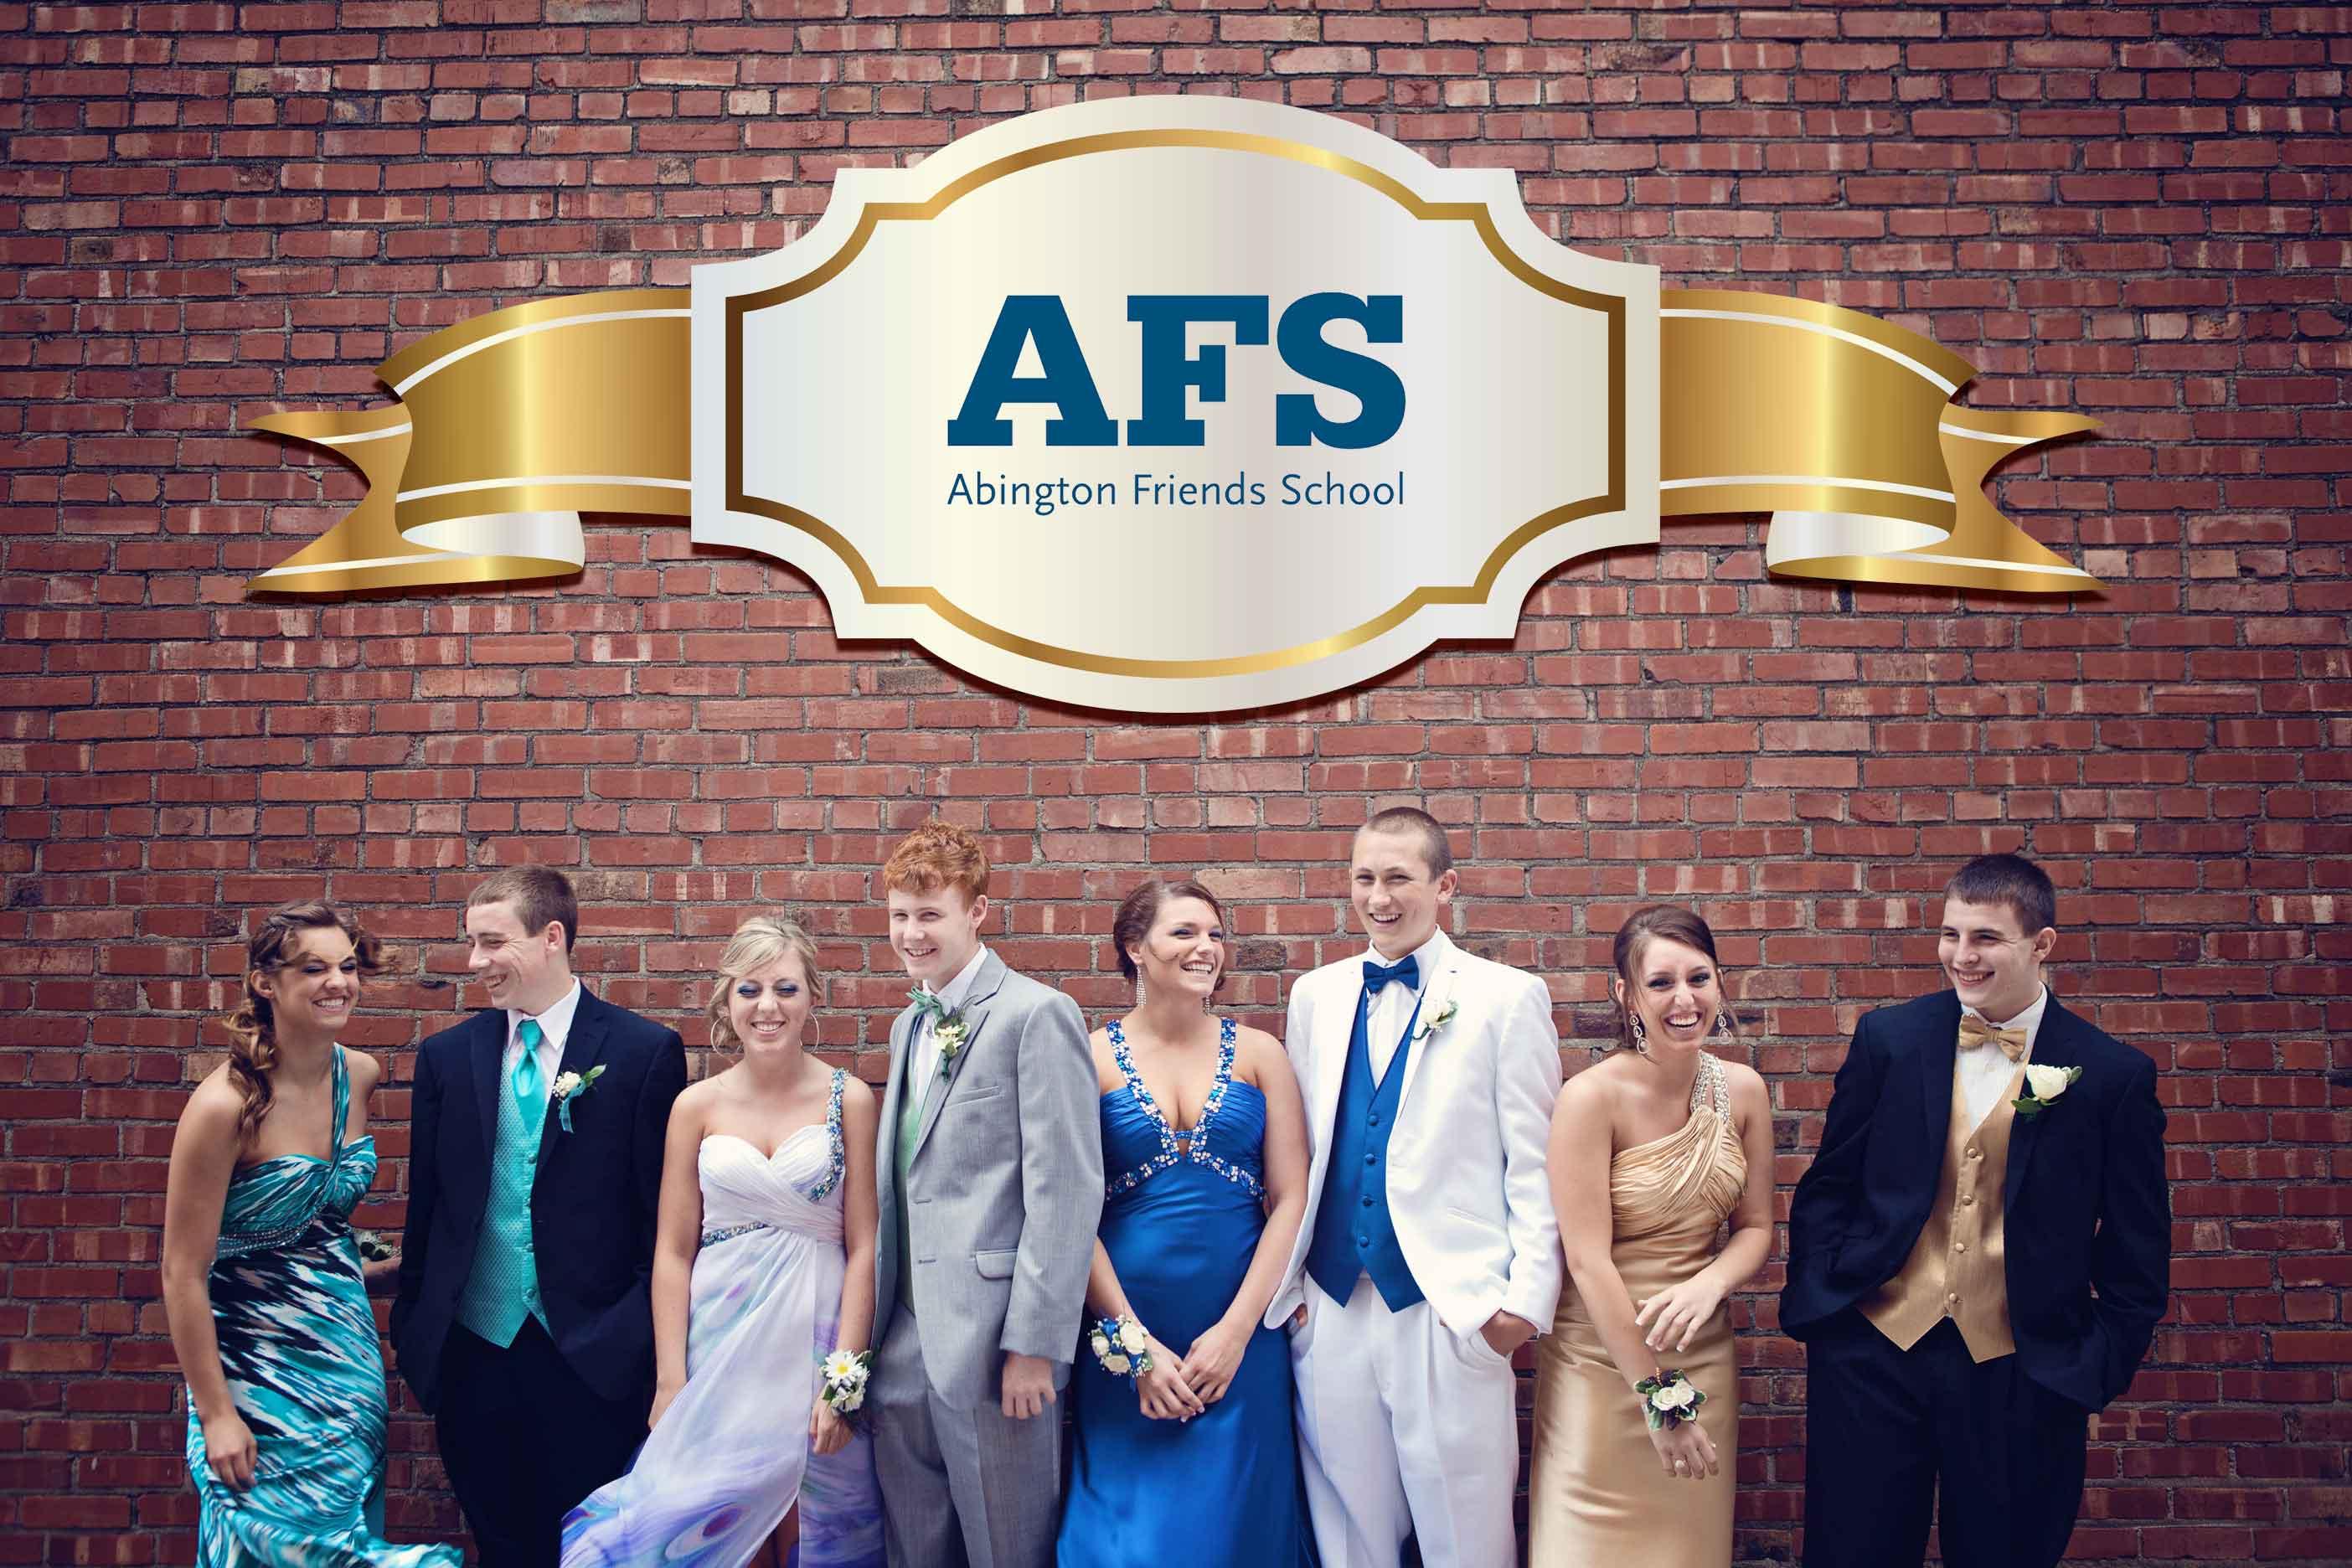 abington friends school prom